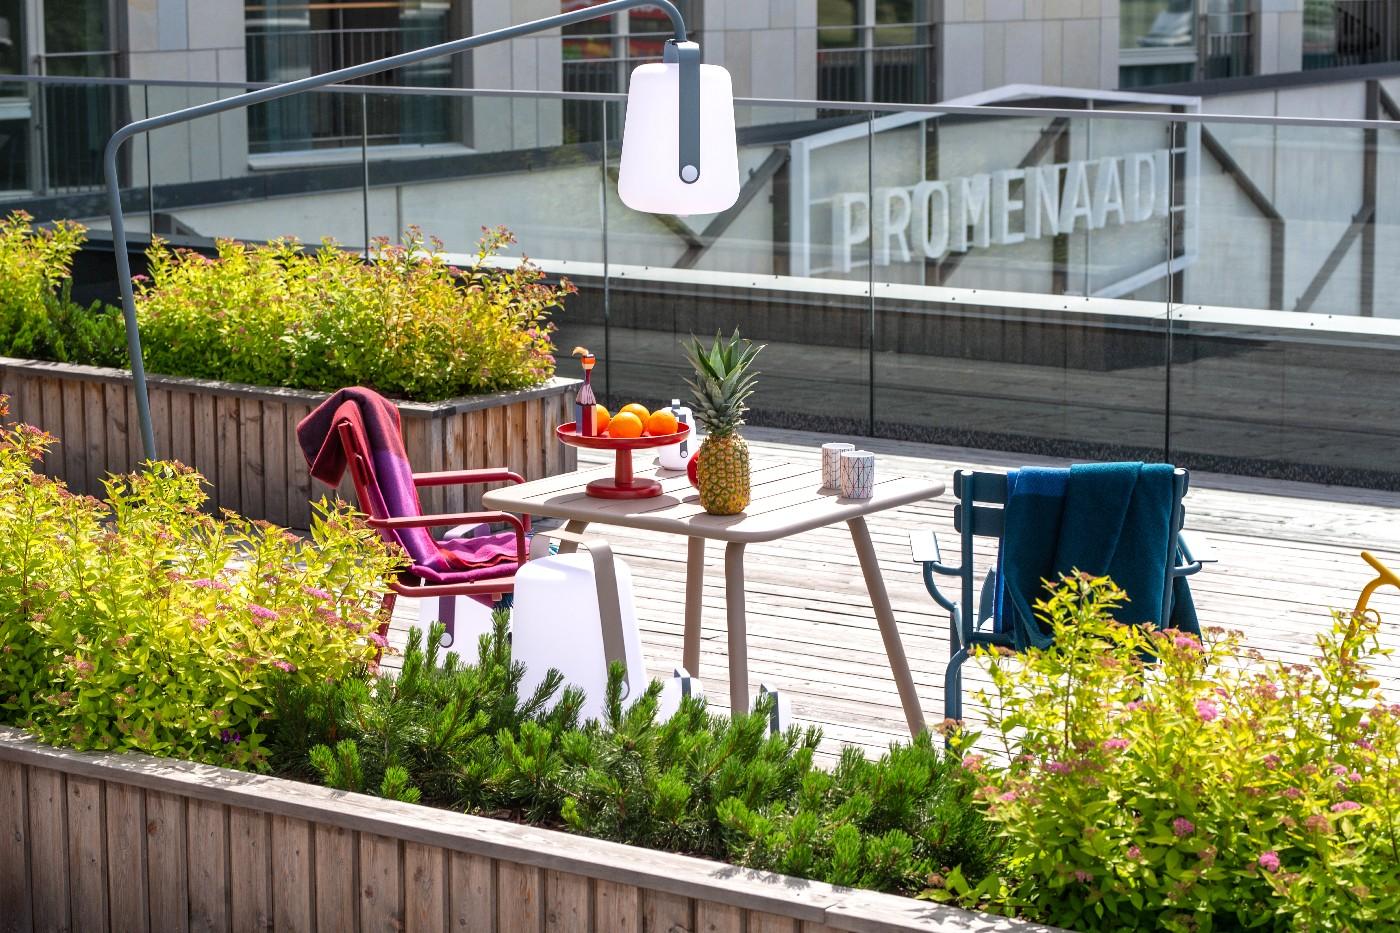 Kinnisvara24: Создайте уютный уголок на террасе или на балконе